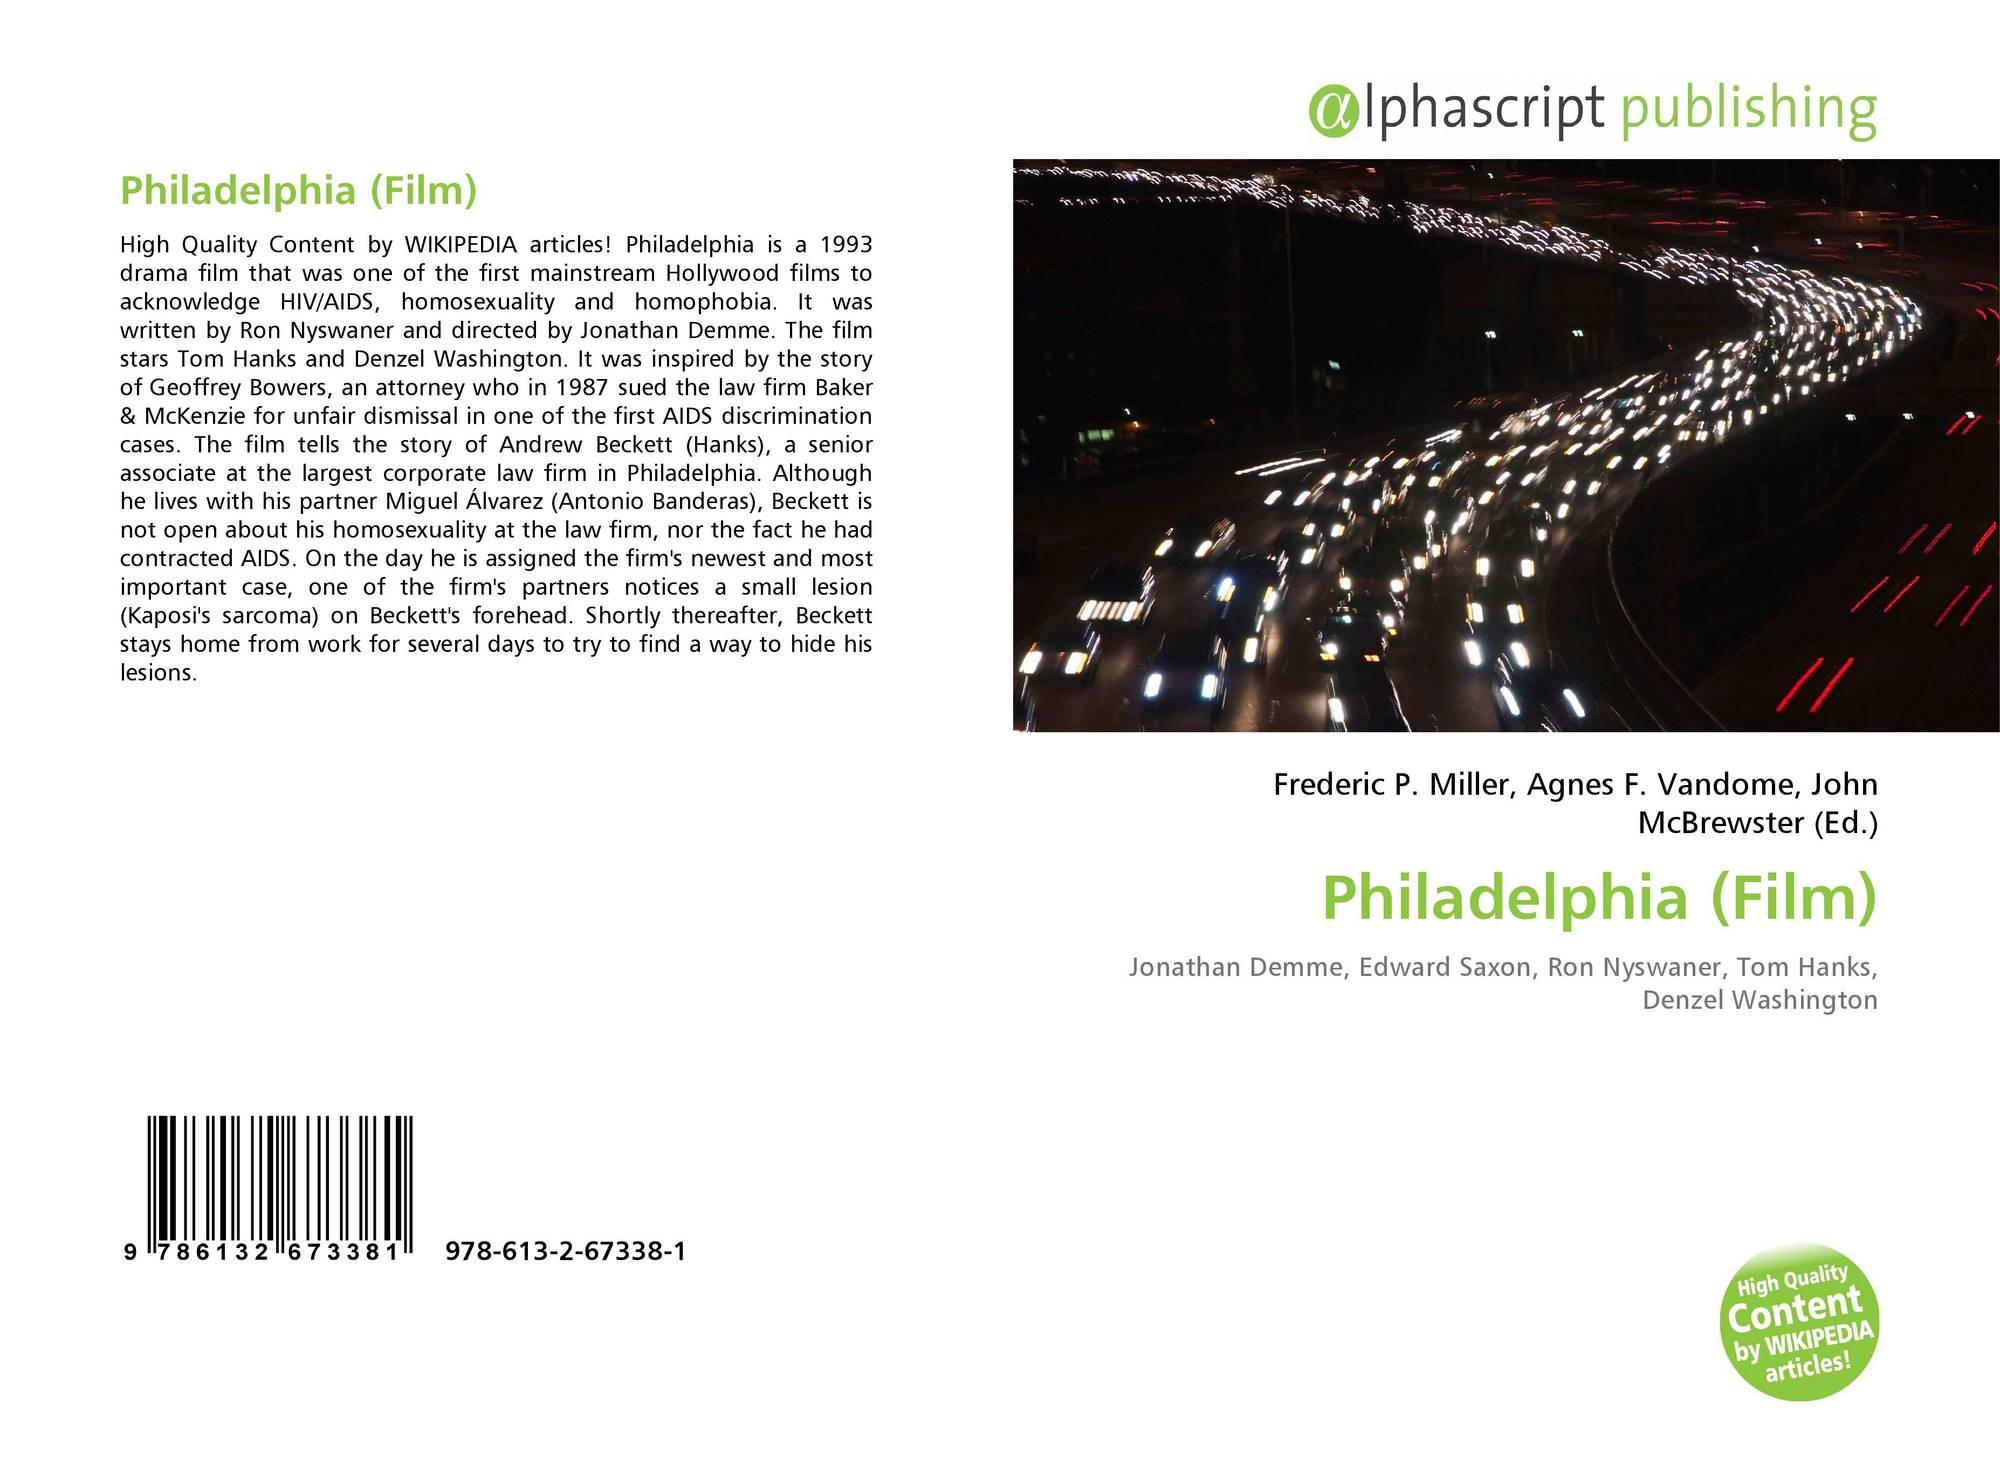 Philadelphia film wikipedia